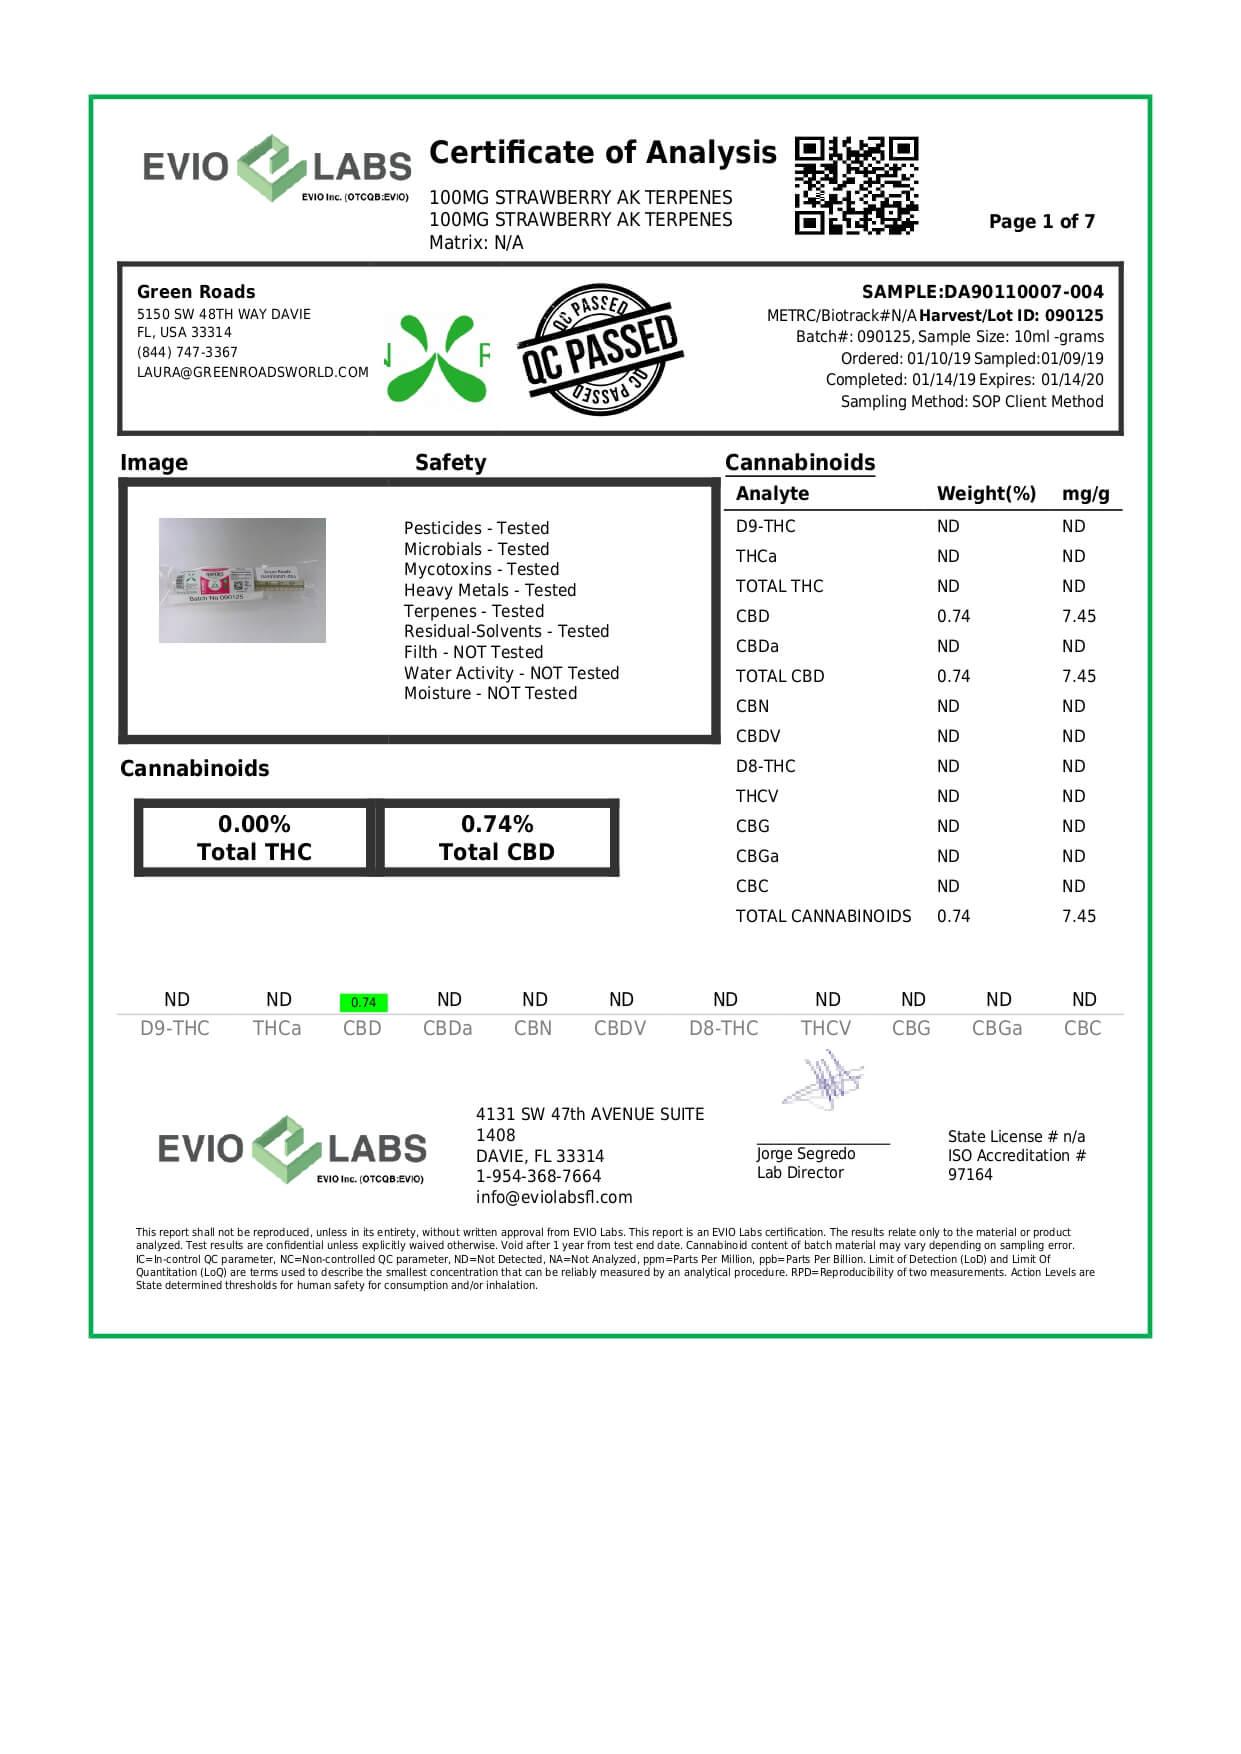 Green Roads CBD Terpenes Oil Strawberry AK 100mg Lab Report